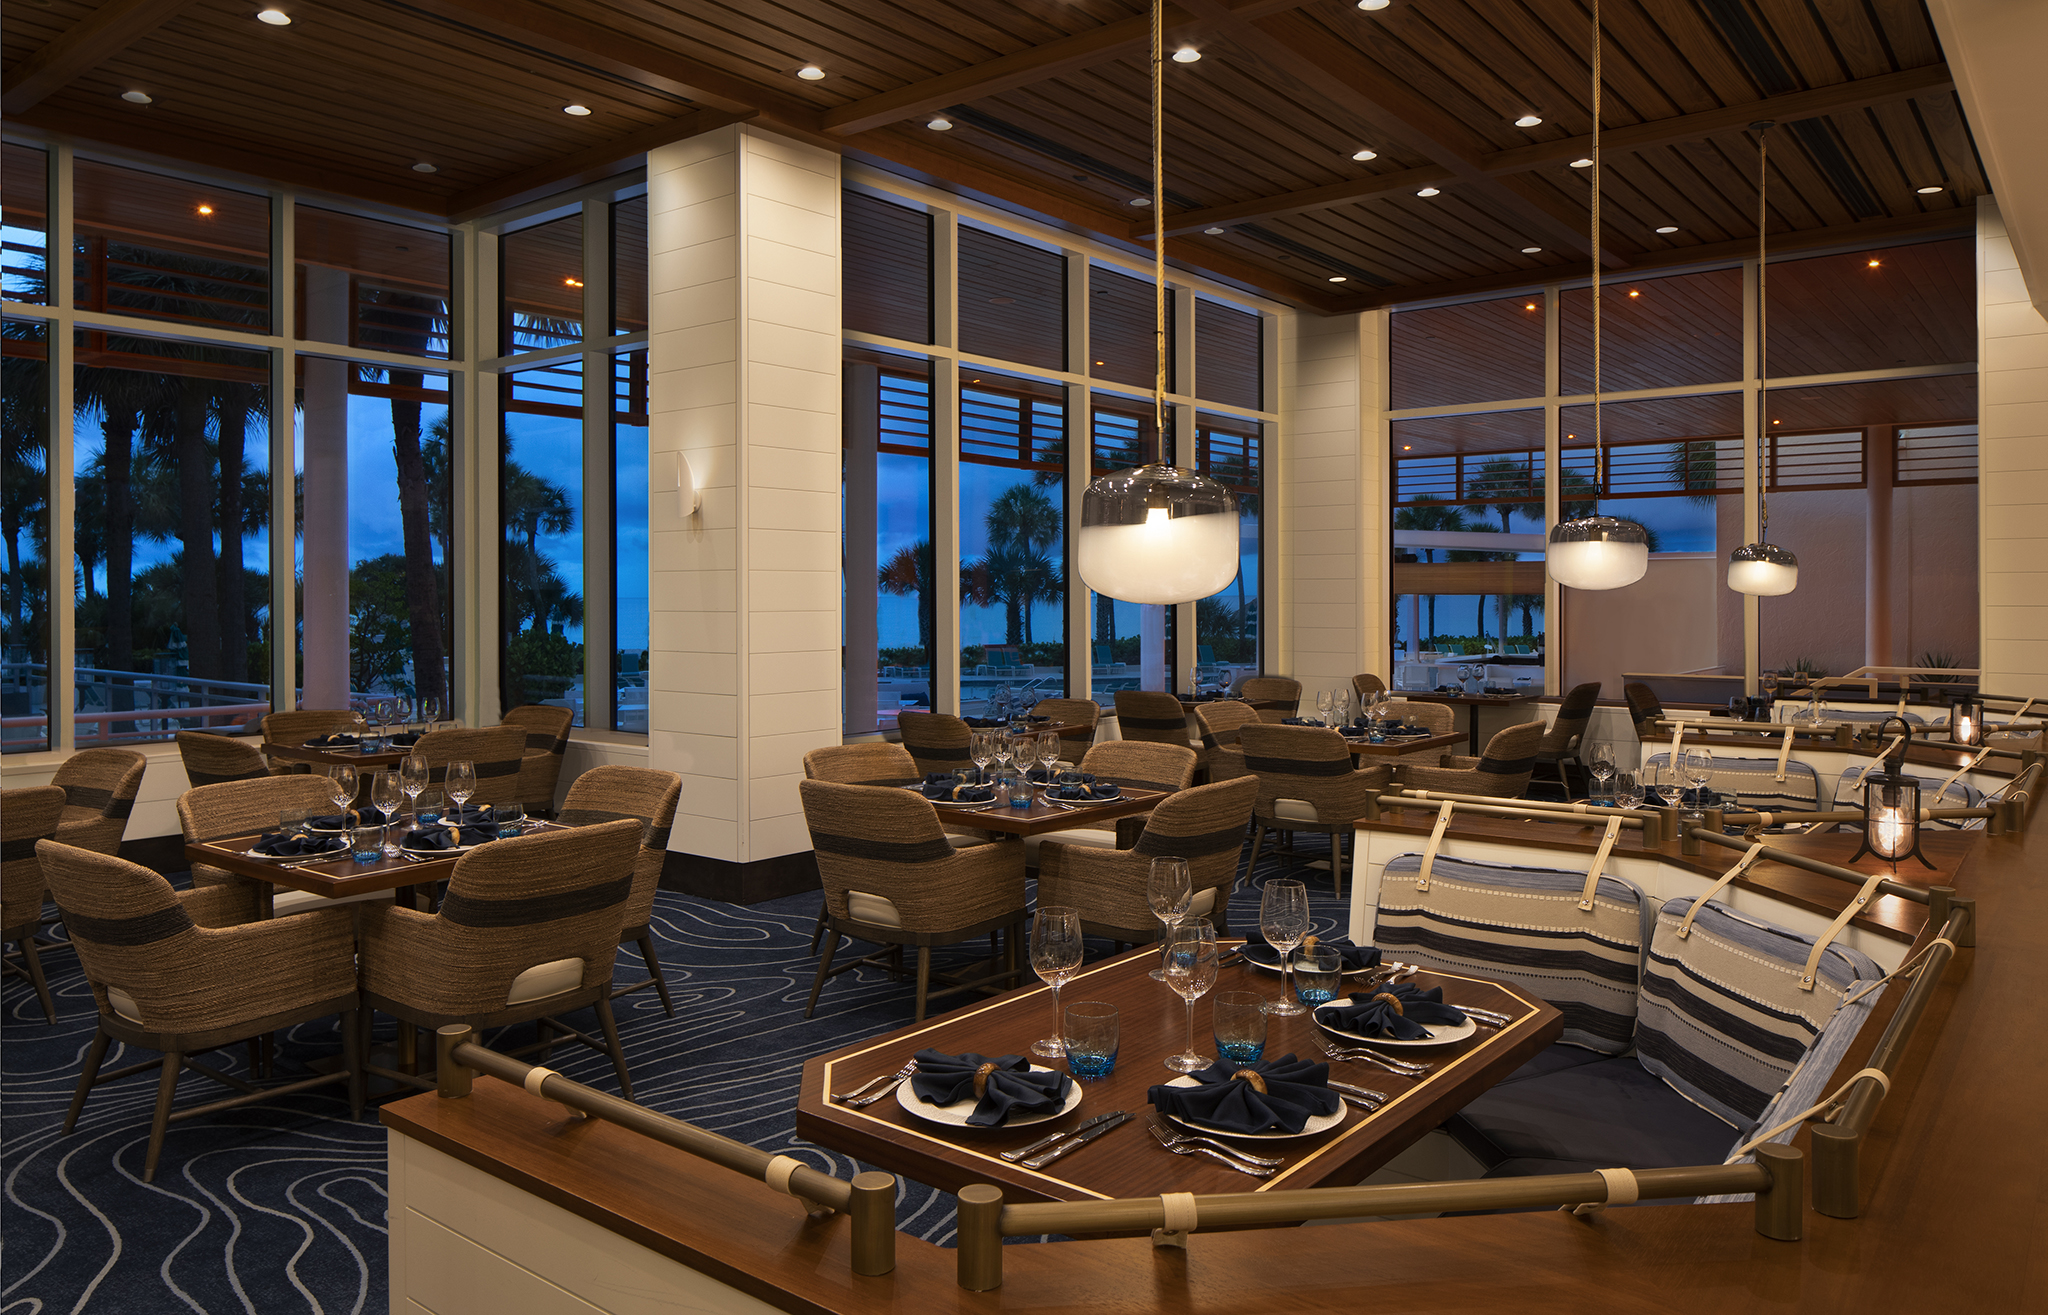 Longboat Dining Room